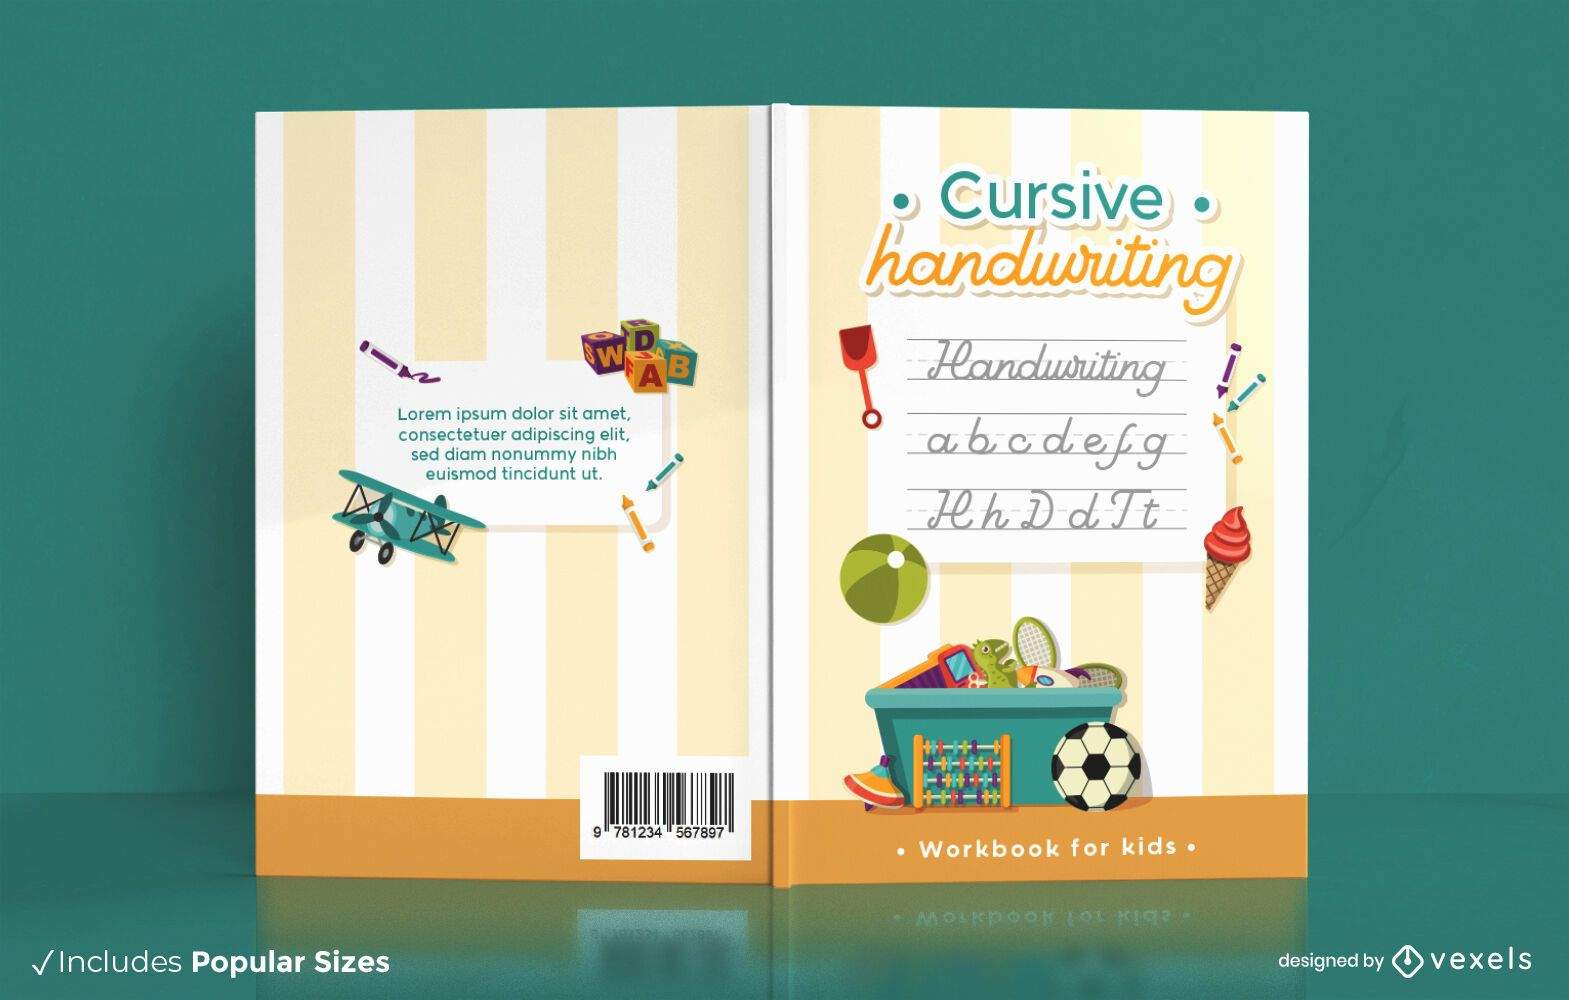 Childrens cursive handwriting book cover design